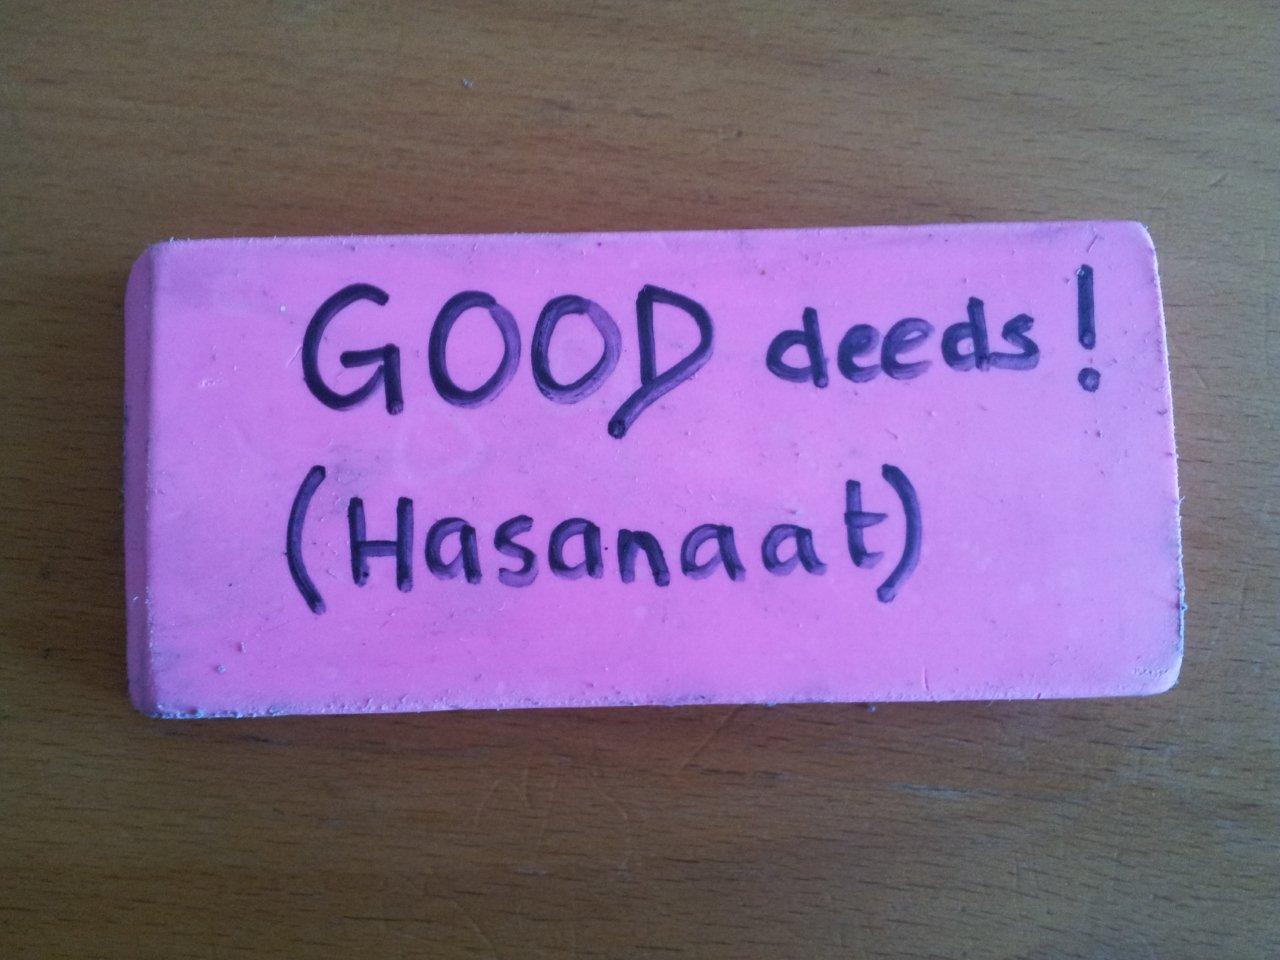 Good Deed Series – 4. Good Deeds take away Bad Deeds